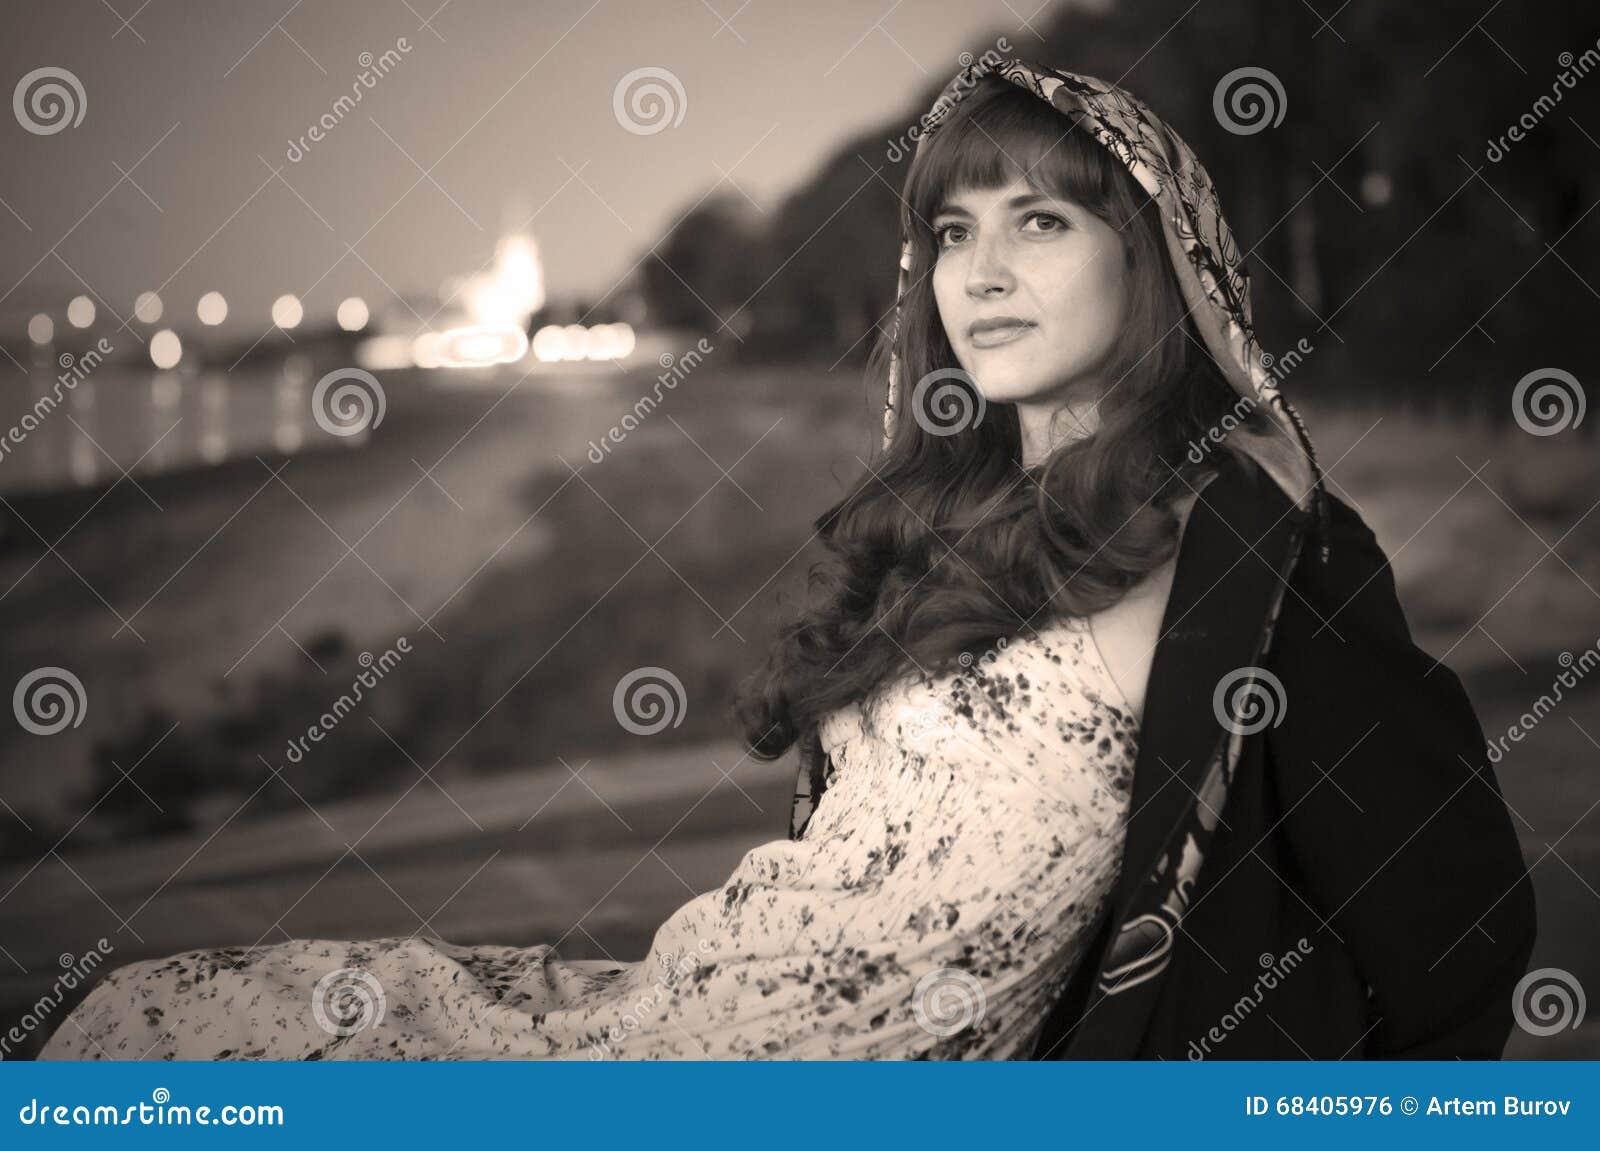 Erotic Girl On Quay Of River Volga Stock Photo - Image of ...